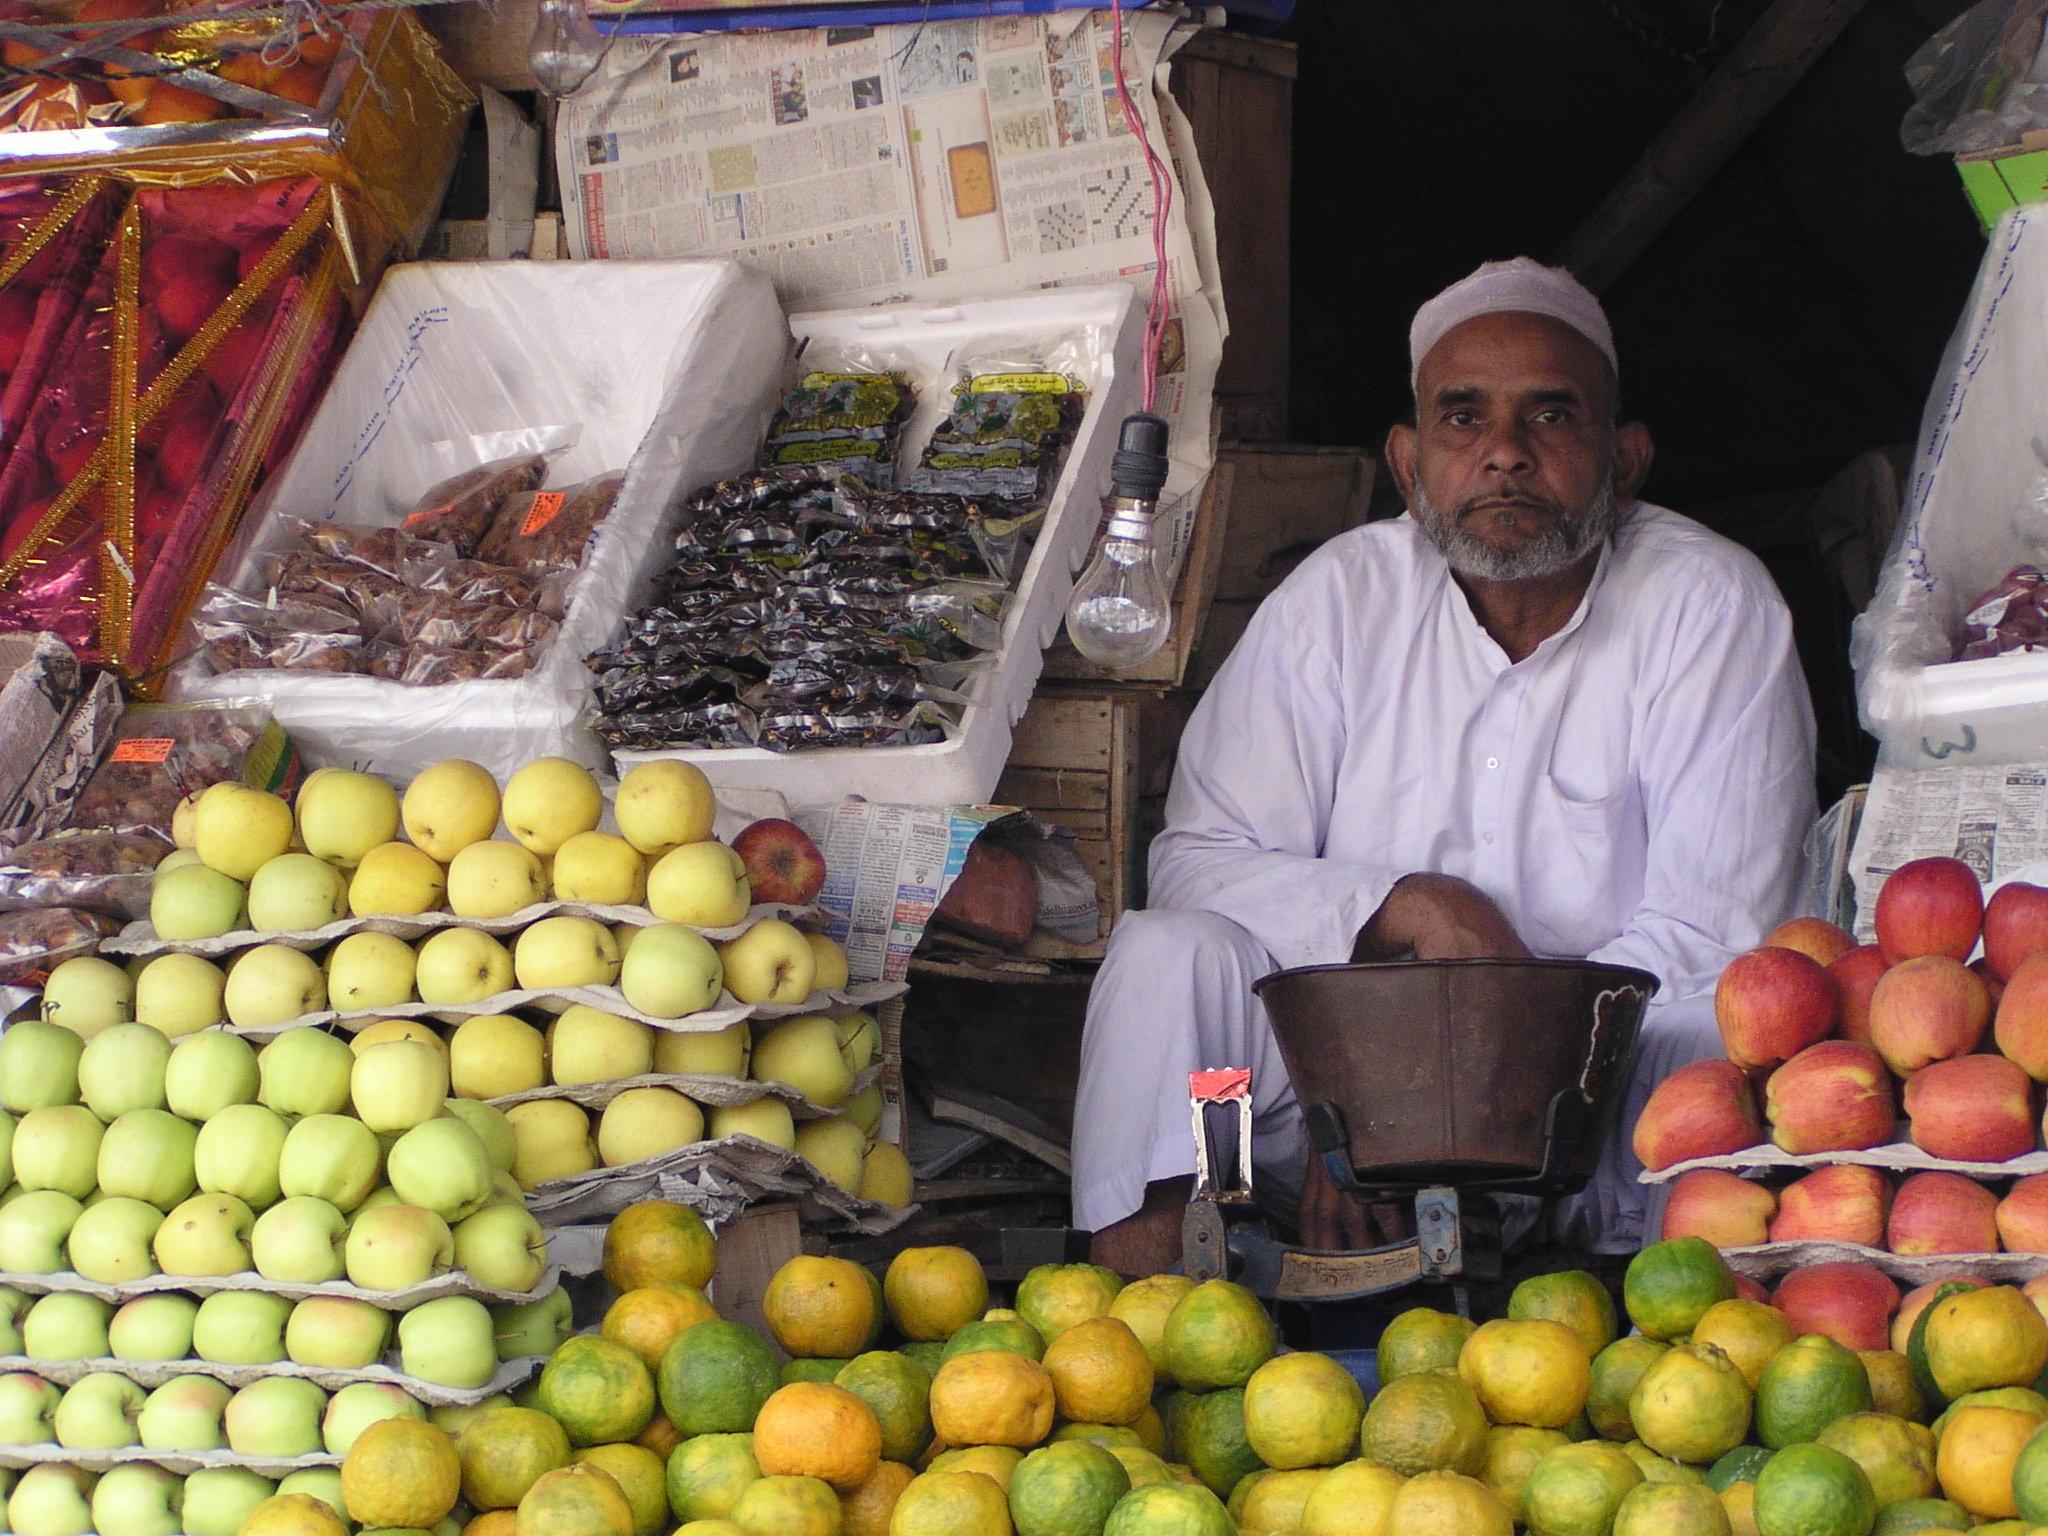 Free Images : fruit, city, vendor, produce, market